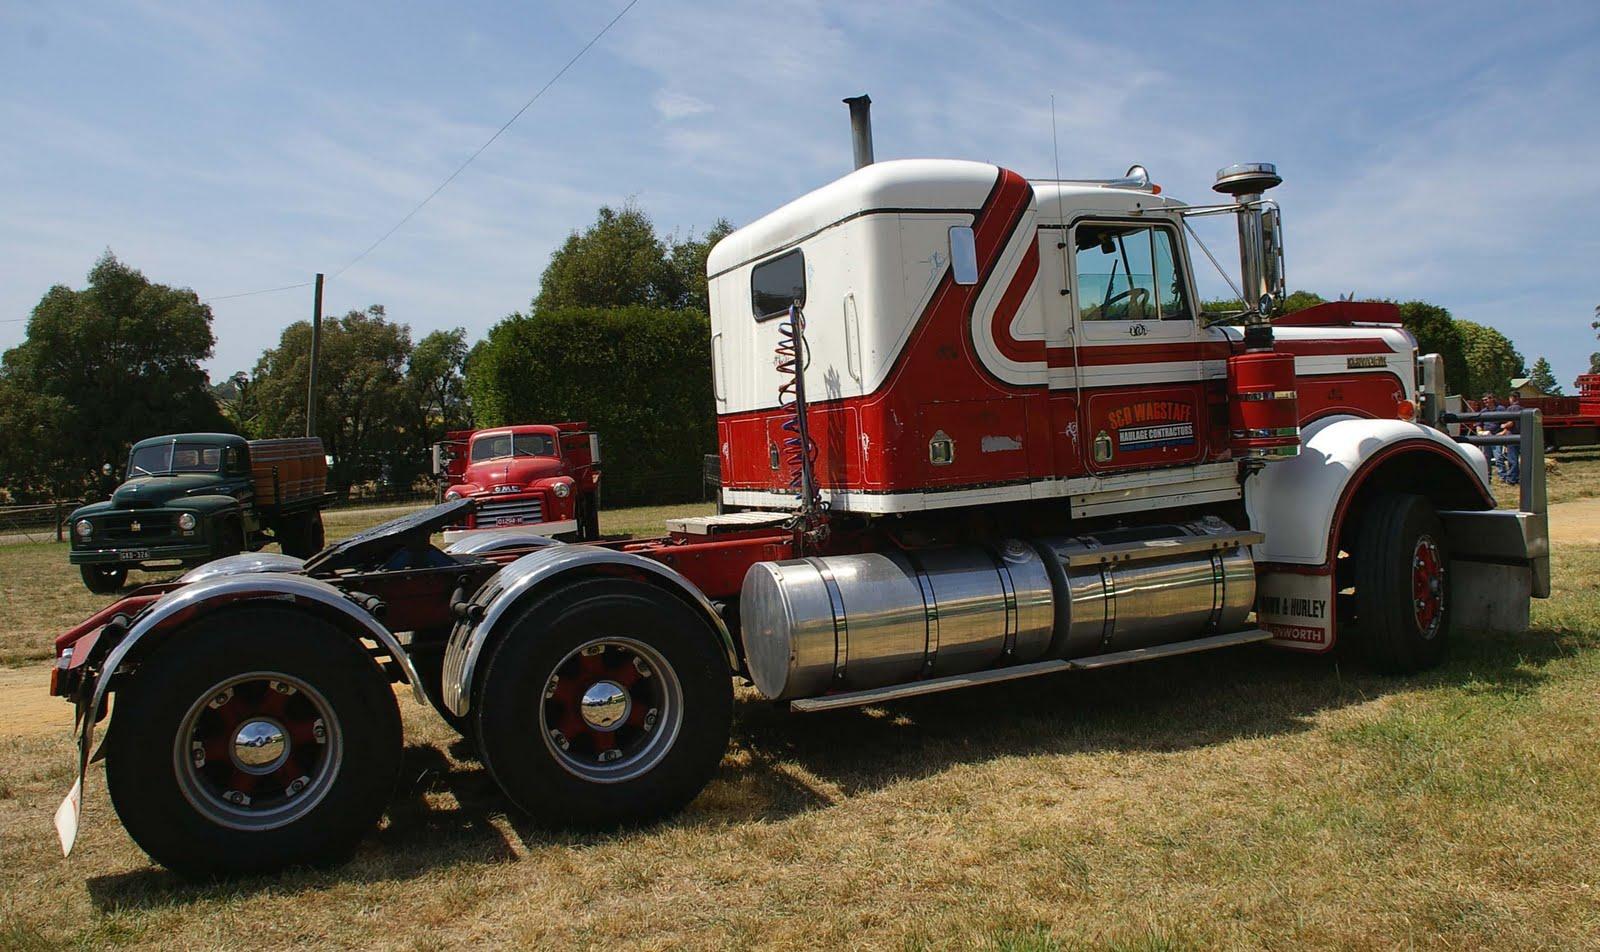 Historic Trucks: Trucks in Action 2010 - Part 2